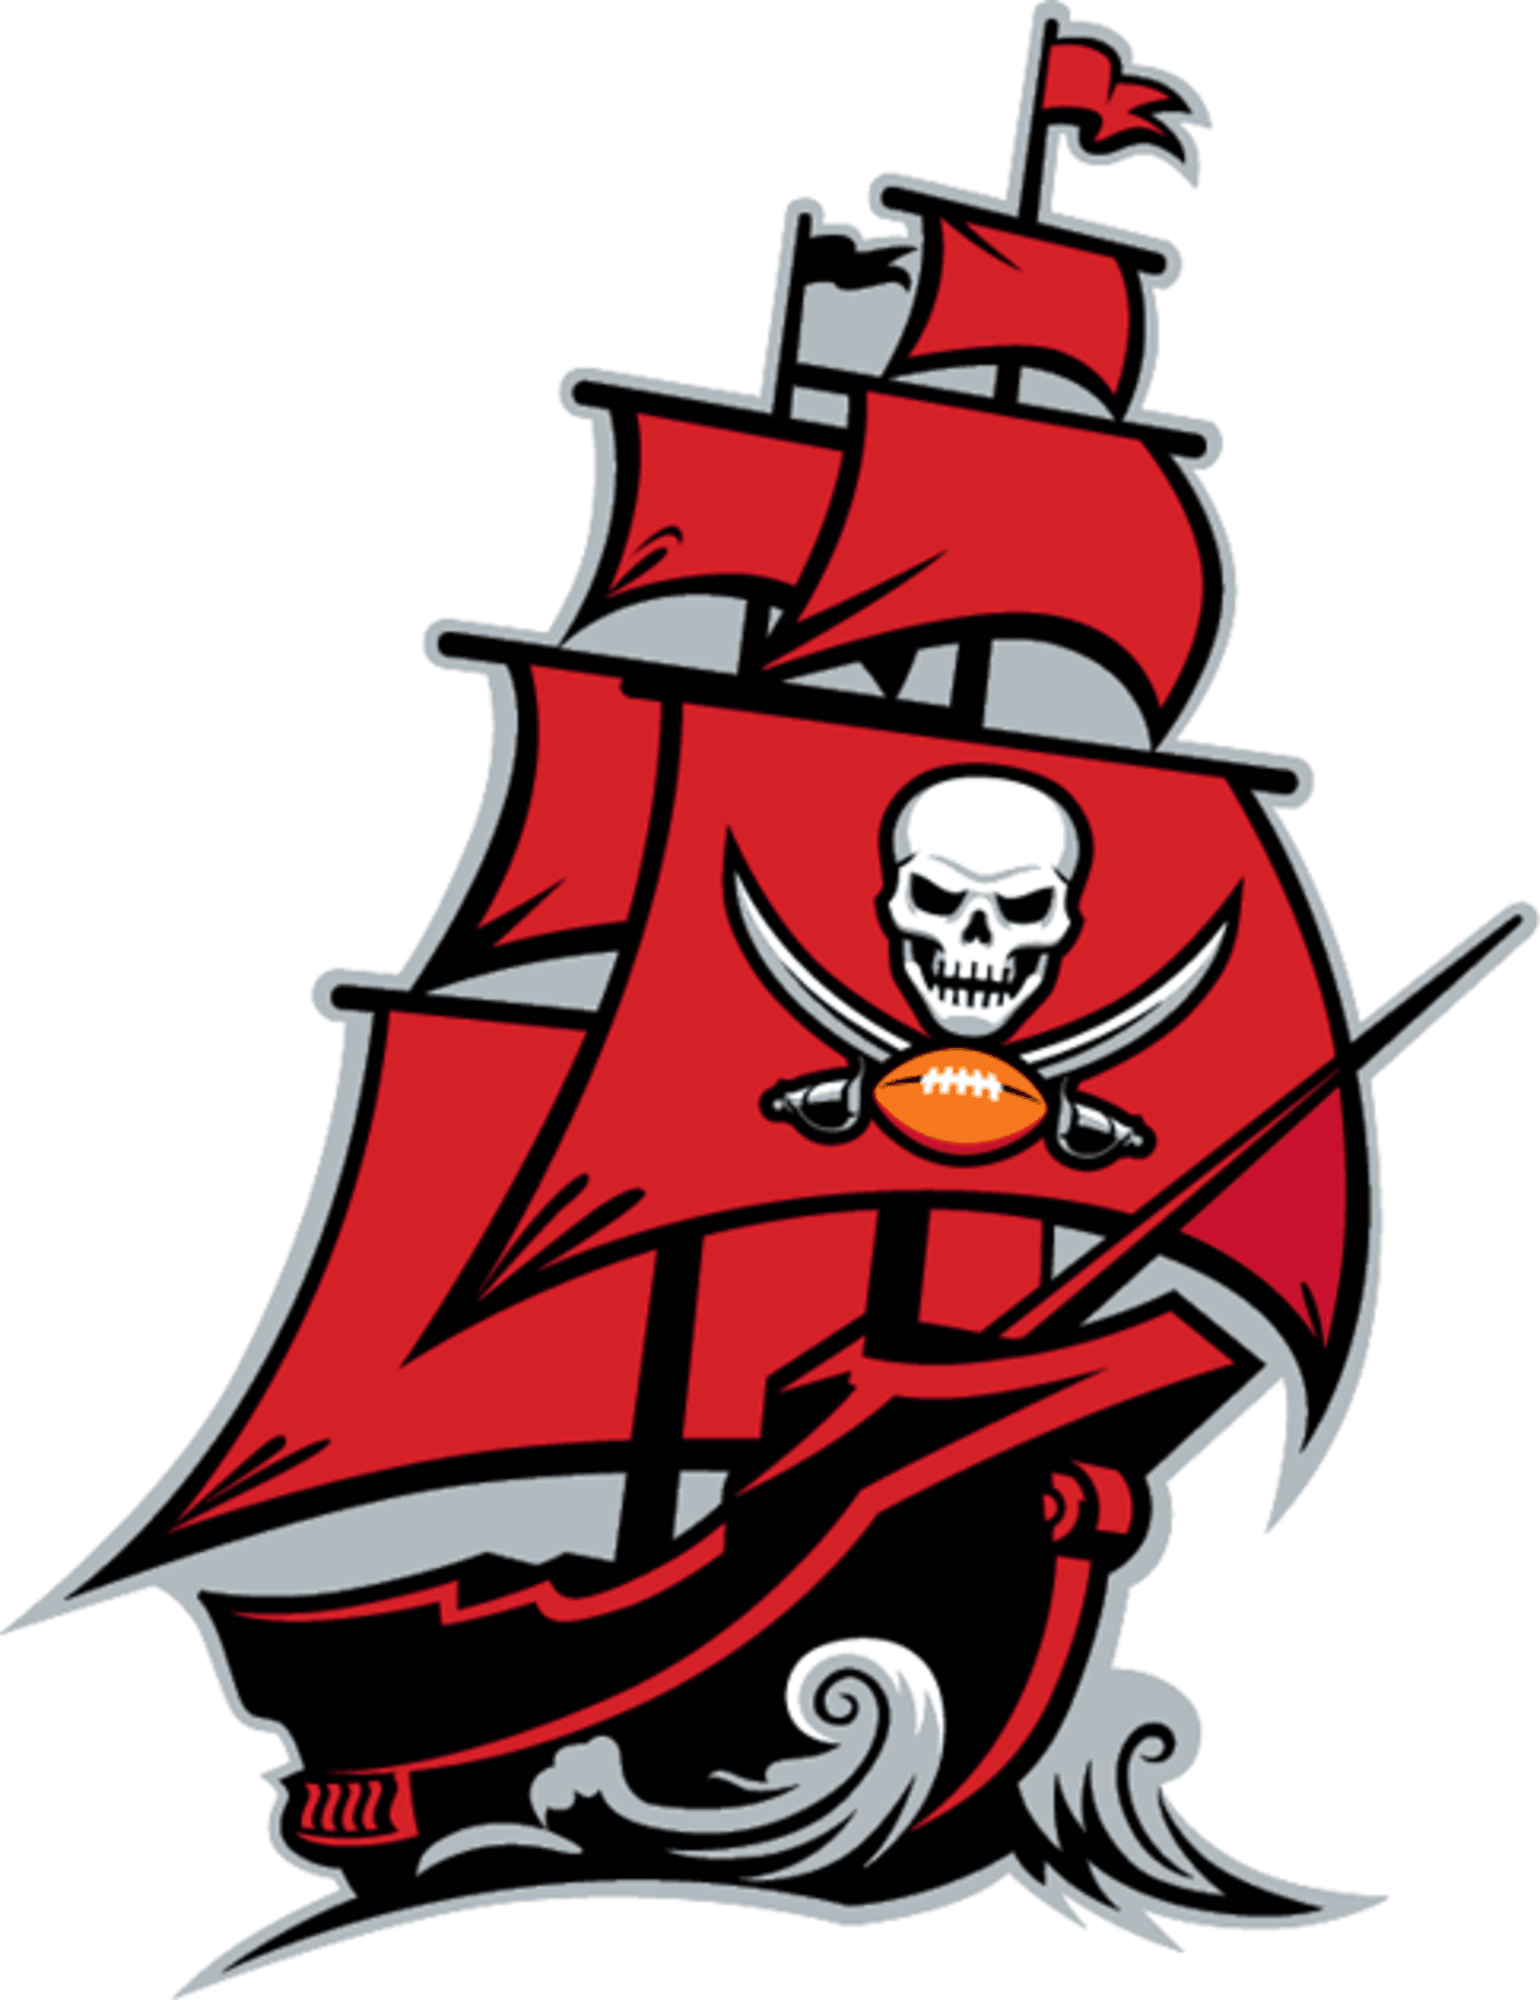 tampa bay buccaneers debut alternate pirate ship logo photo tampa bay buccaneers debut alternate